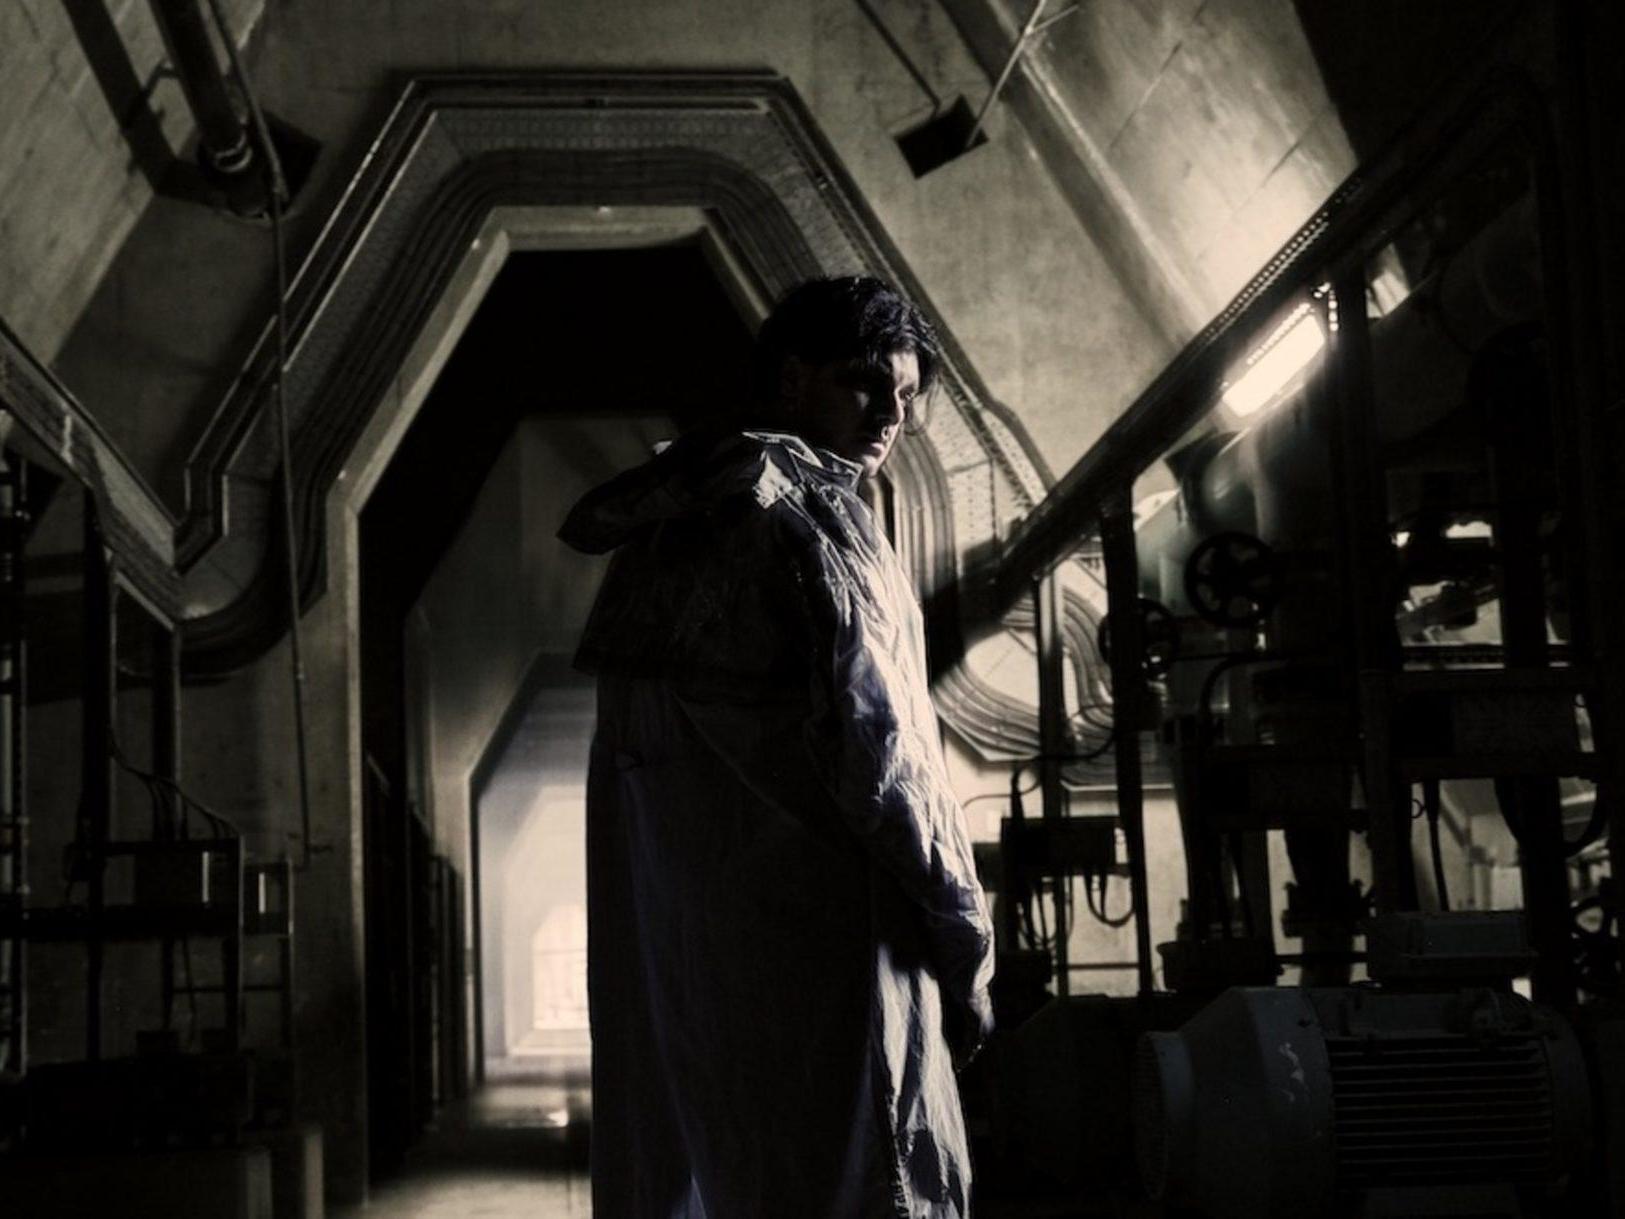 Jai Paul: Secretive musician returns with two new songs